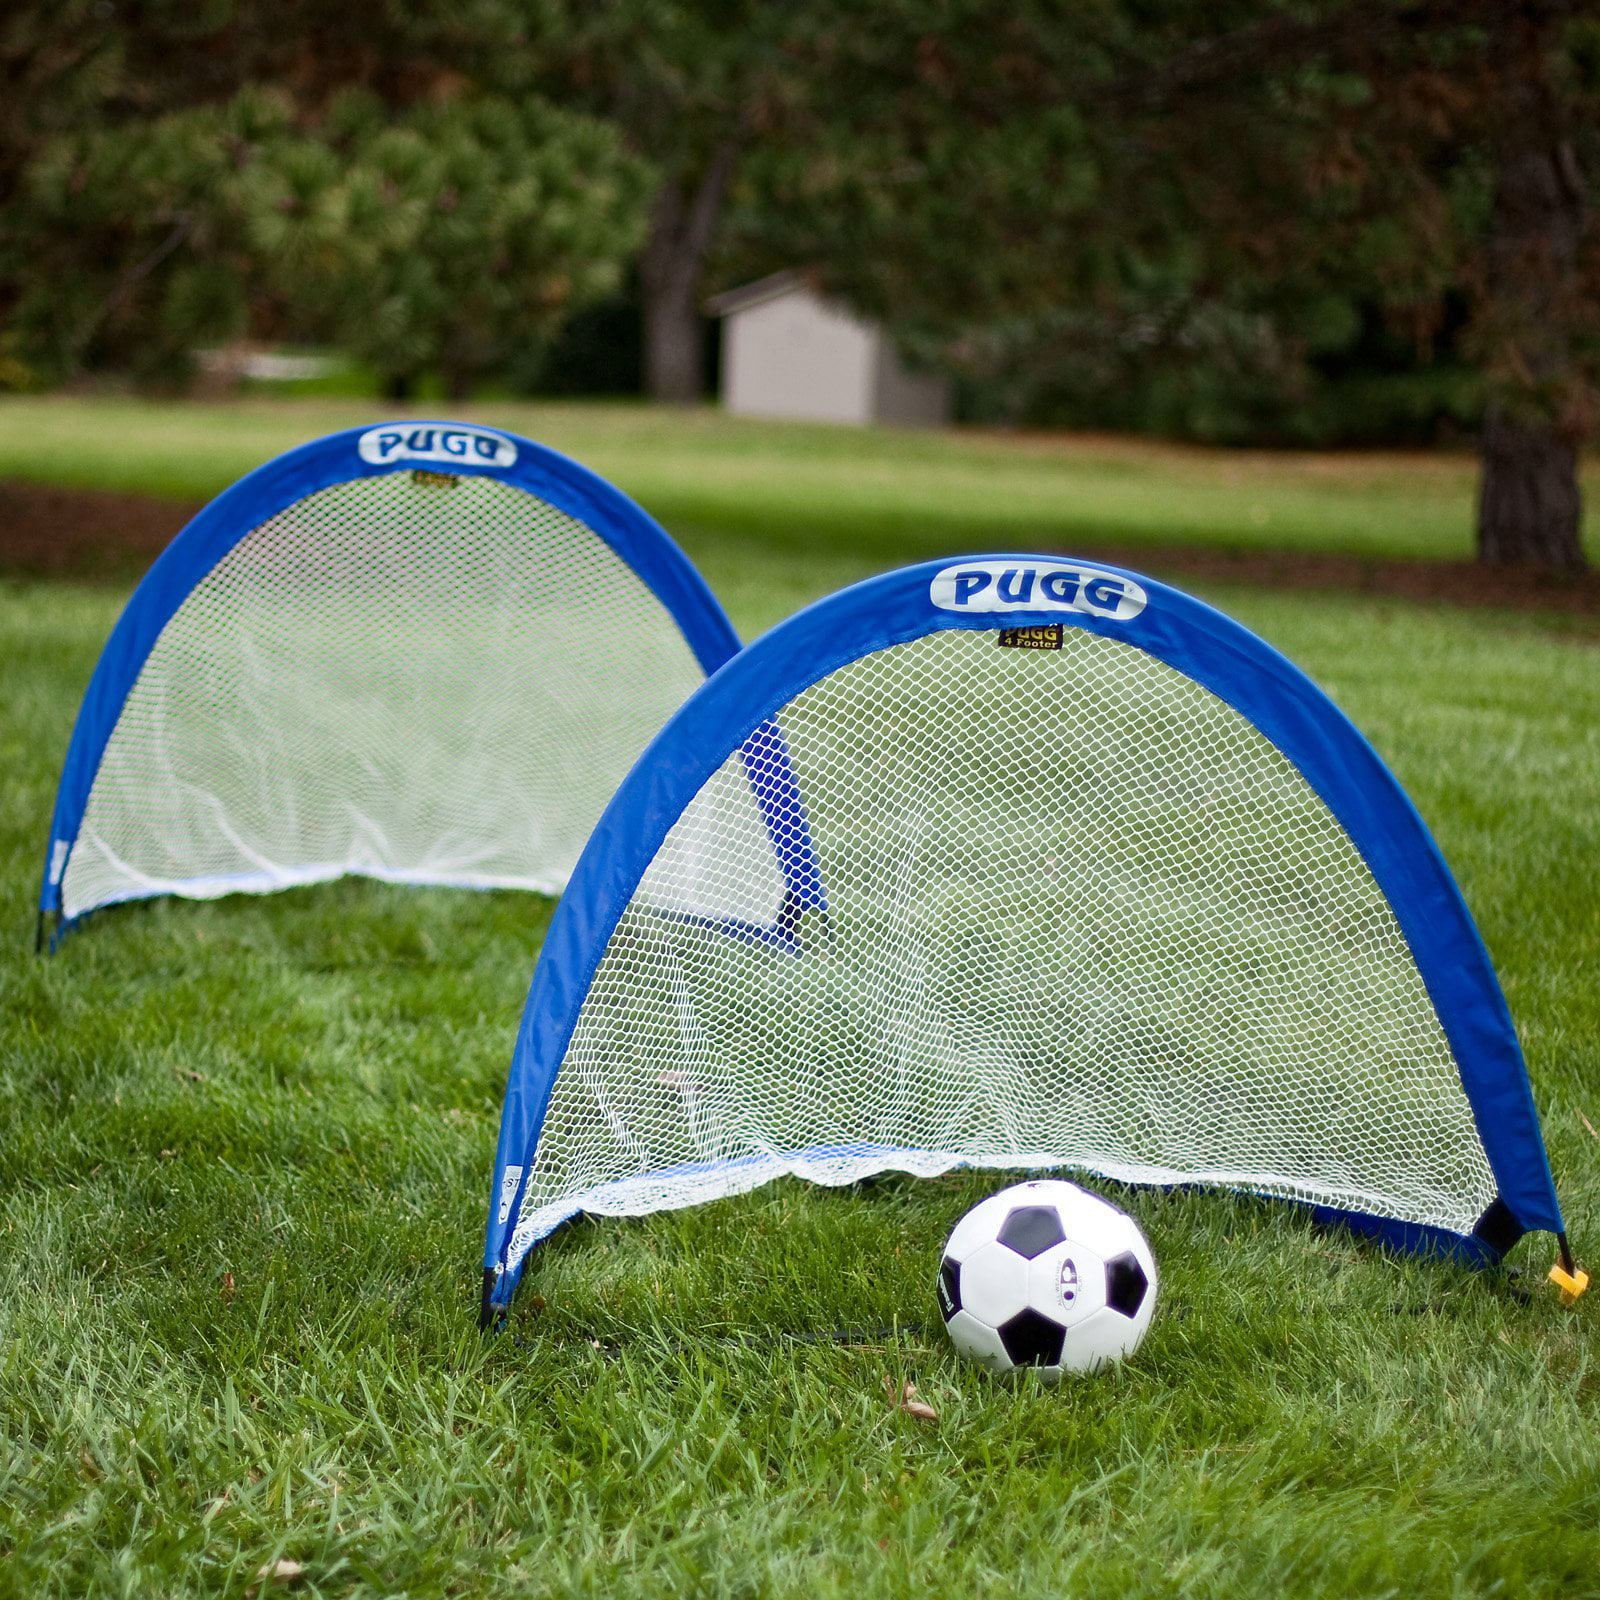 36979eebd PUGG Classic 4 Foot Pop Up Soccer Goal Pair (Includes set of 2 goals and  Carry Bag) - Walmart.com